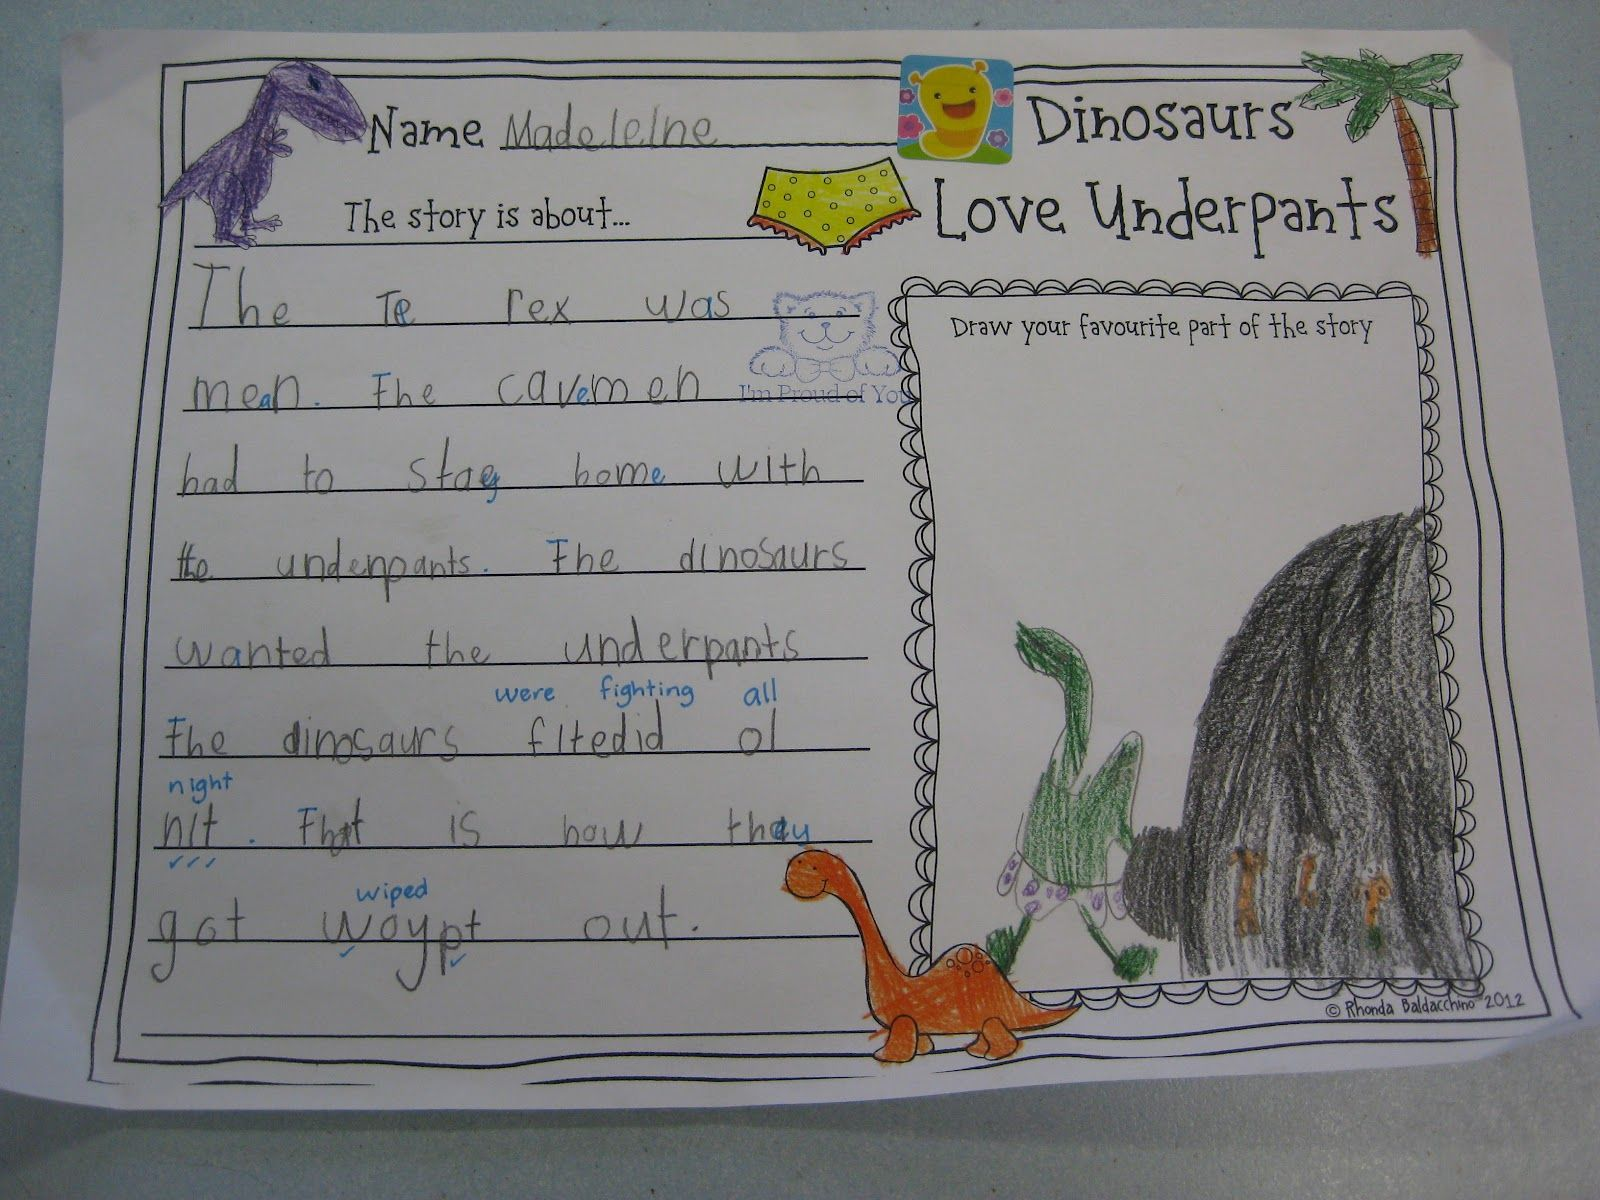 Classroom Fun Dinosaurs Love Underpants Dinosaur Lesson Classroom Fun Dinosaur Activities [ 1200 x 1600 Pixel ]